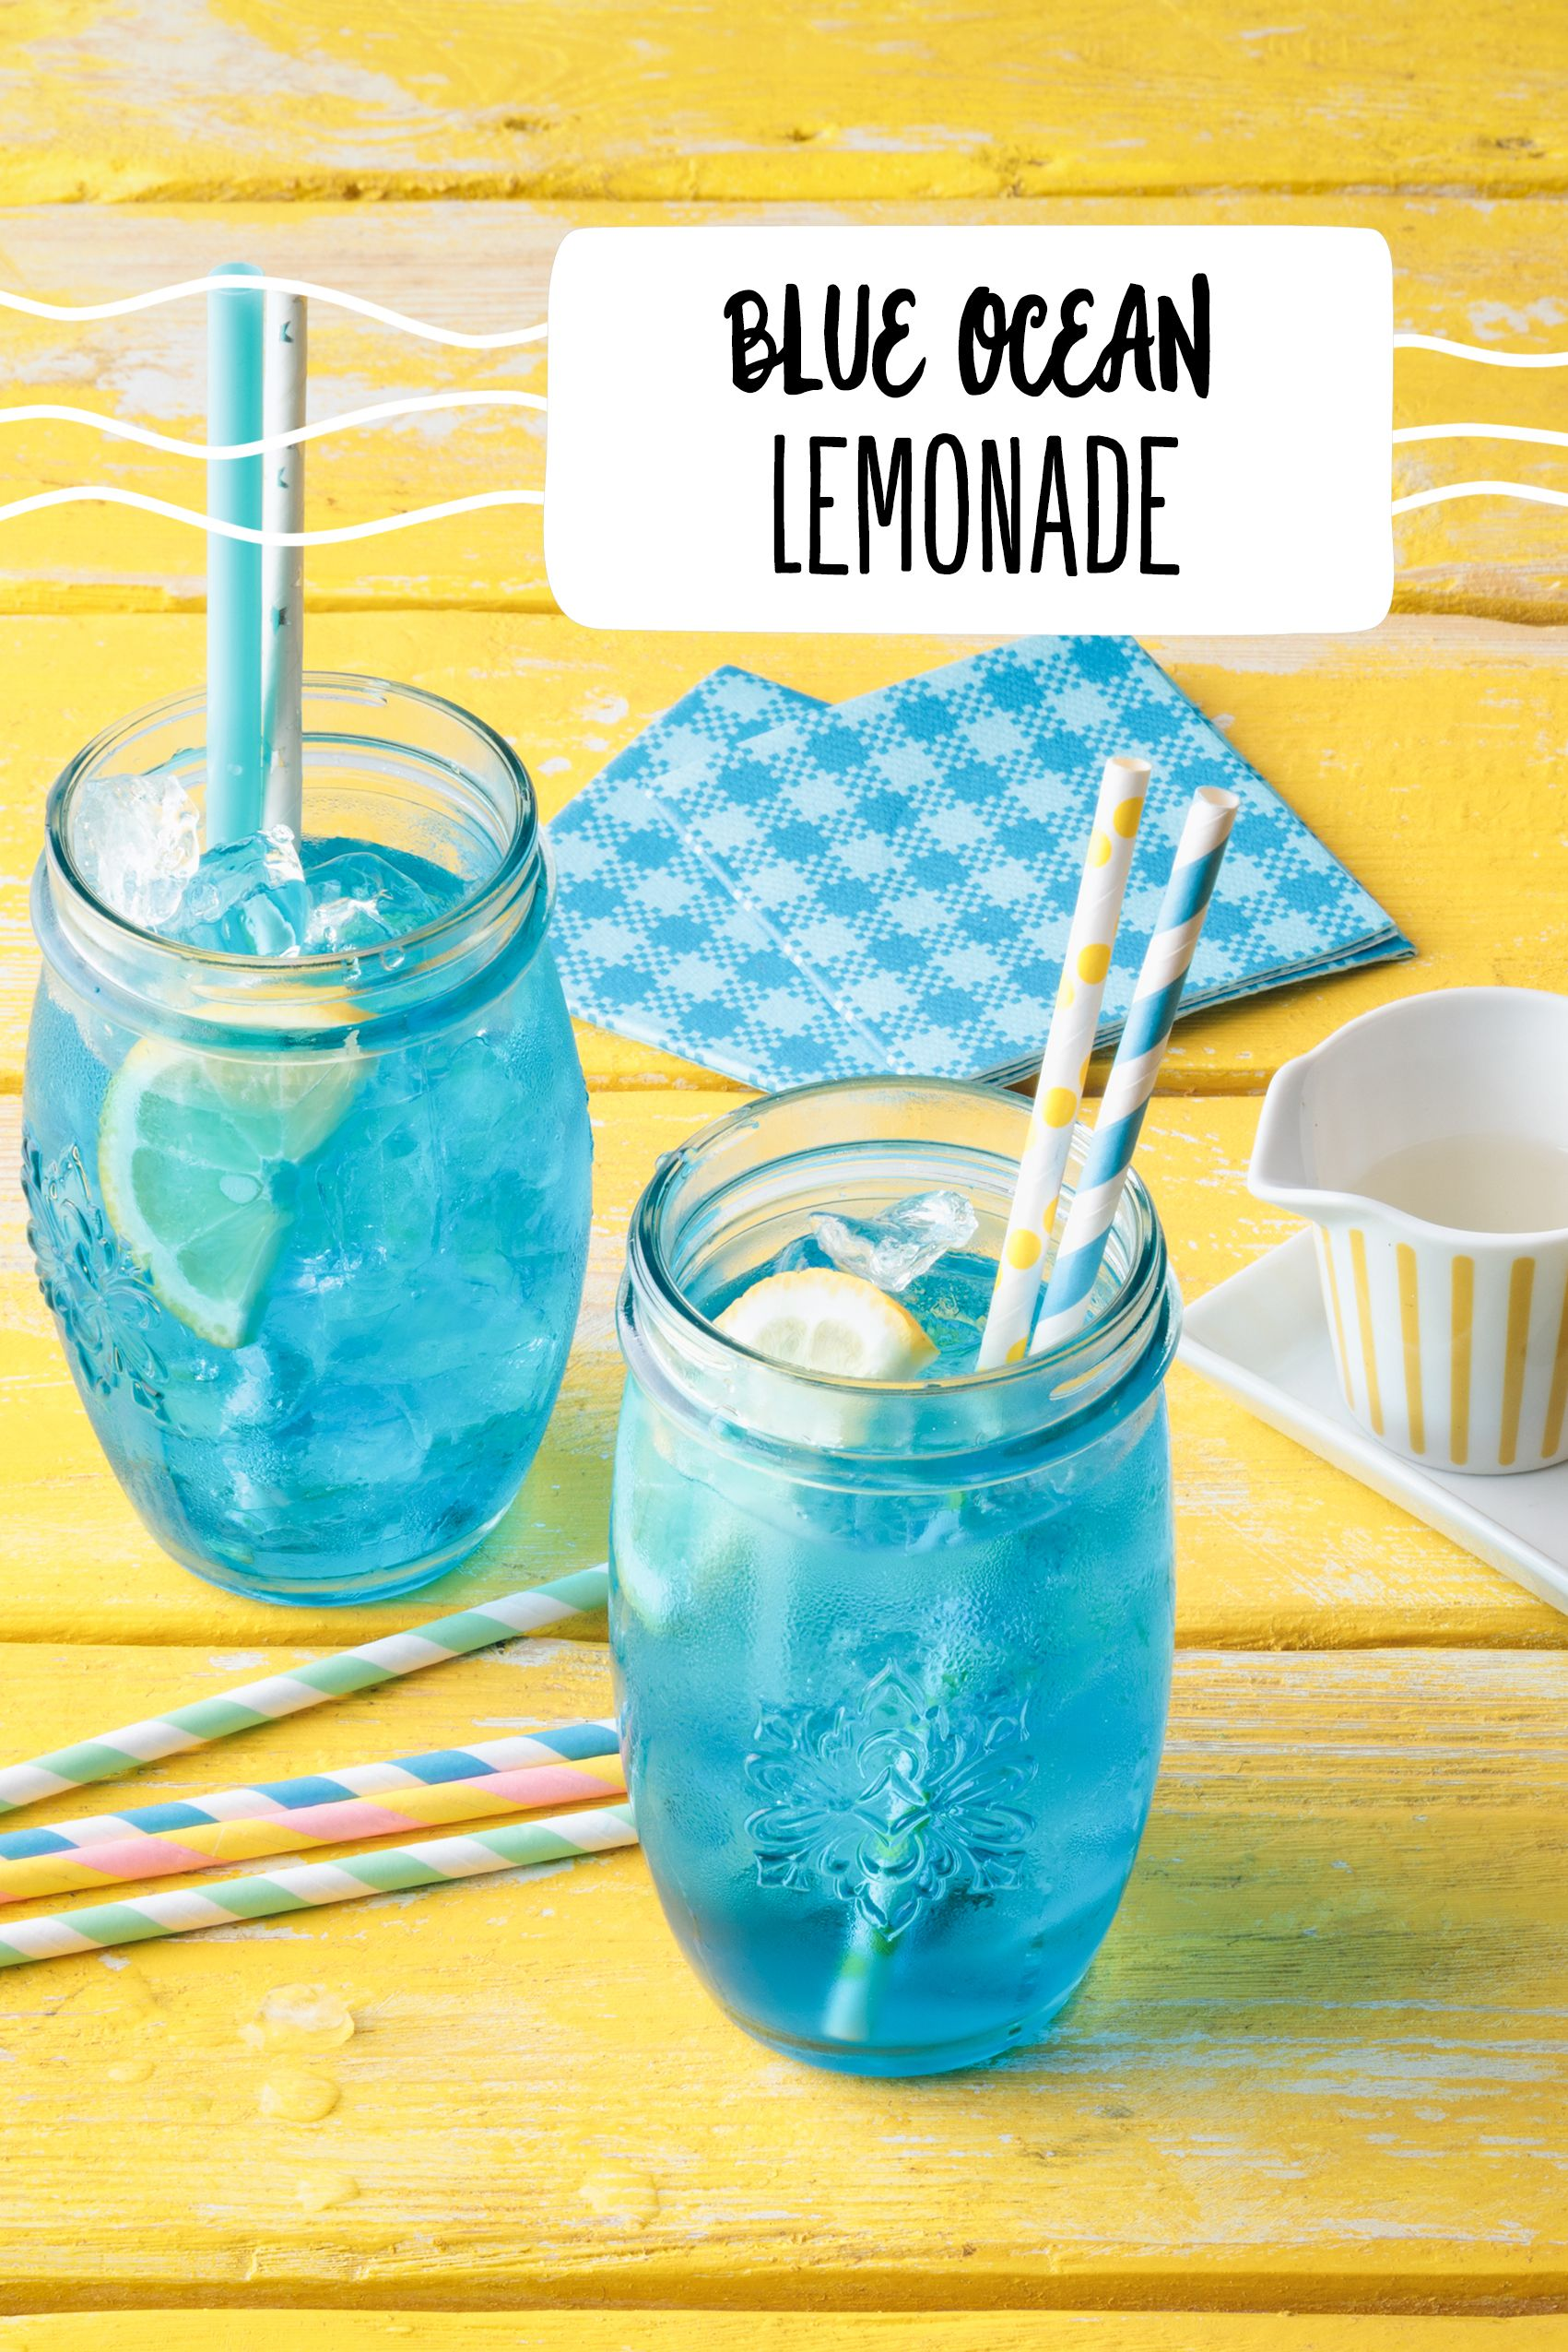 Blue Ocean Lemonade #zitrone #blau #limonade #sprite #drink #rewe Drink Getränk Zitrone #freshdrinks